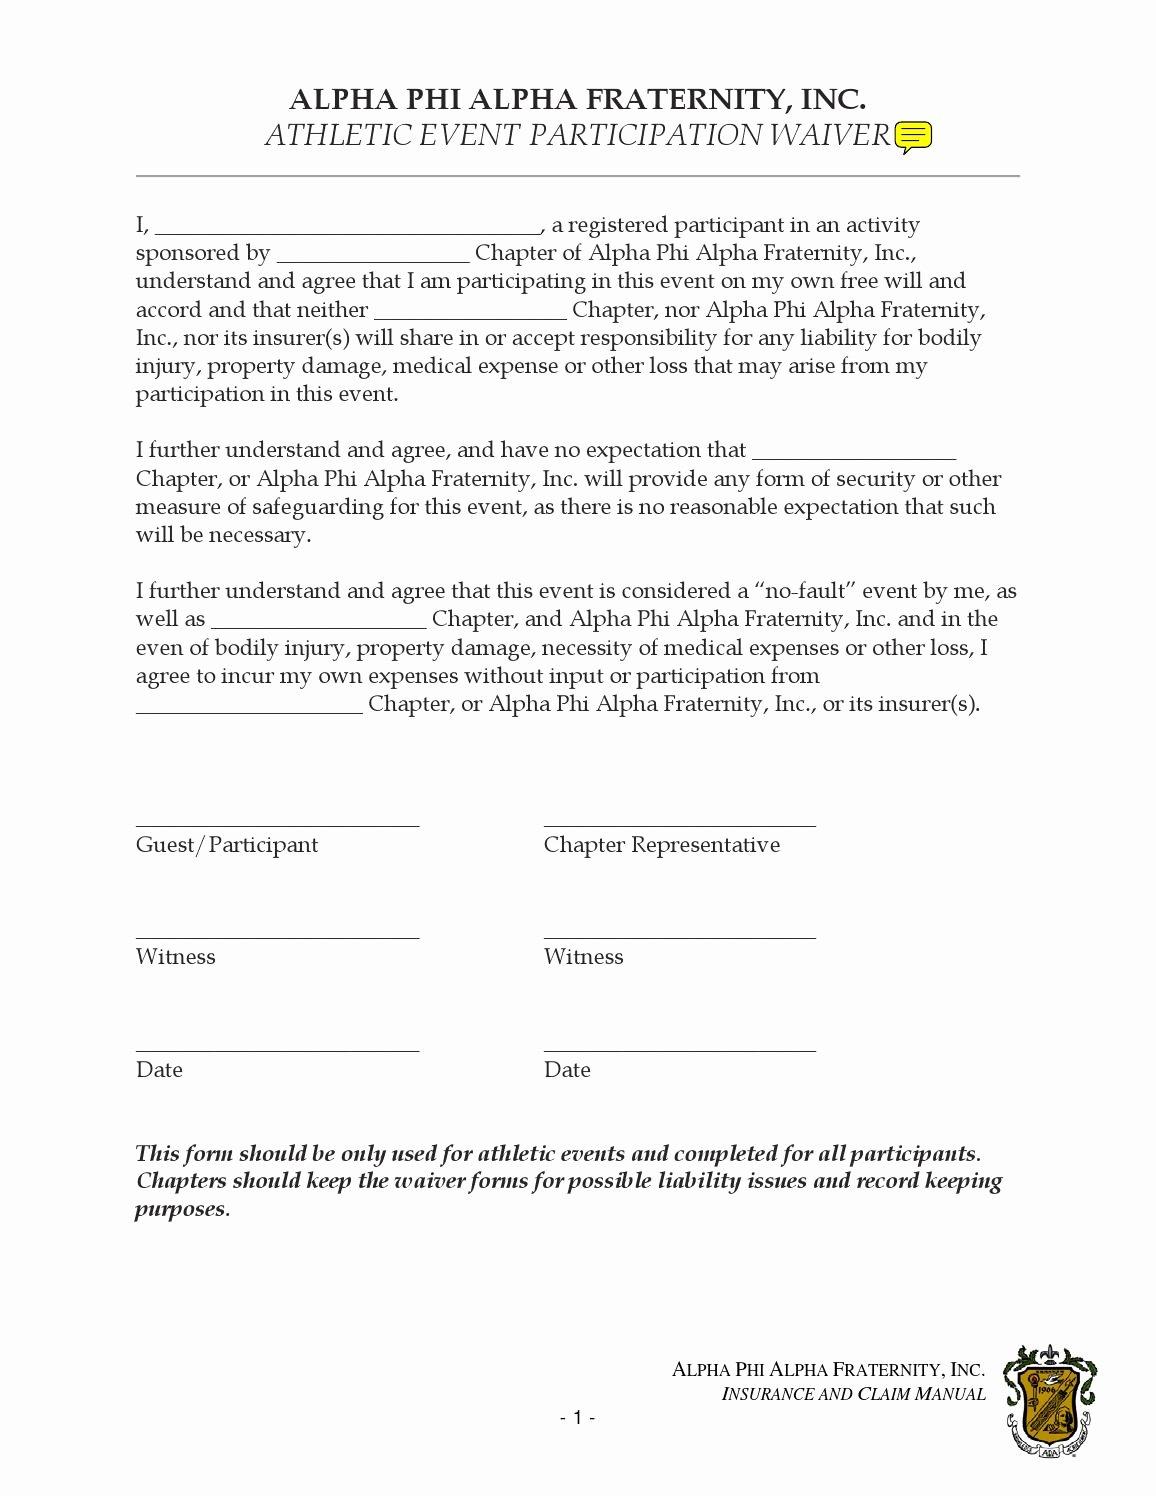 Yoga Waiver form Alliance – Blog Dandk